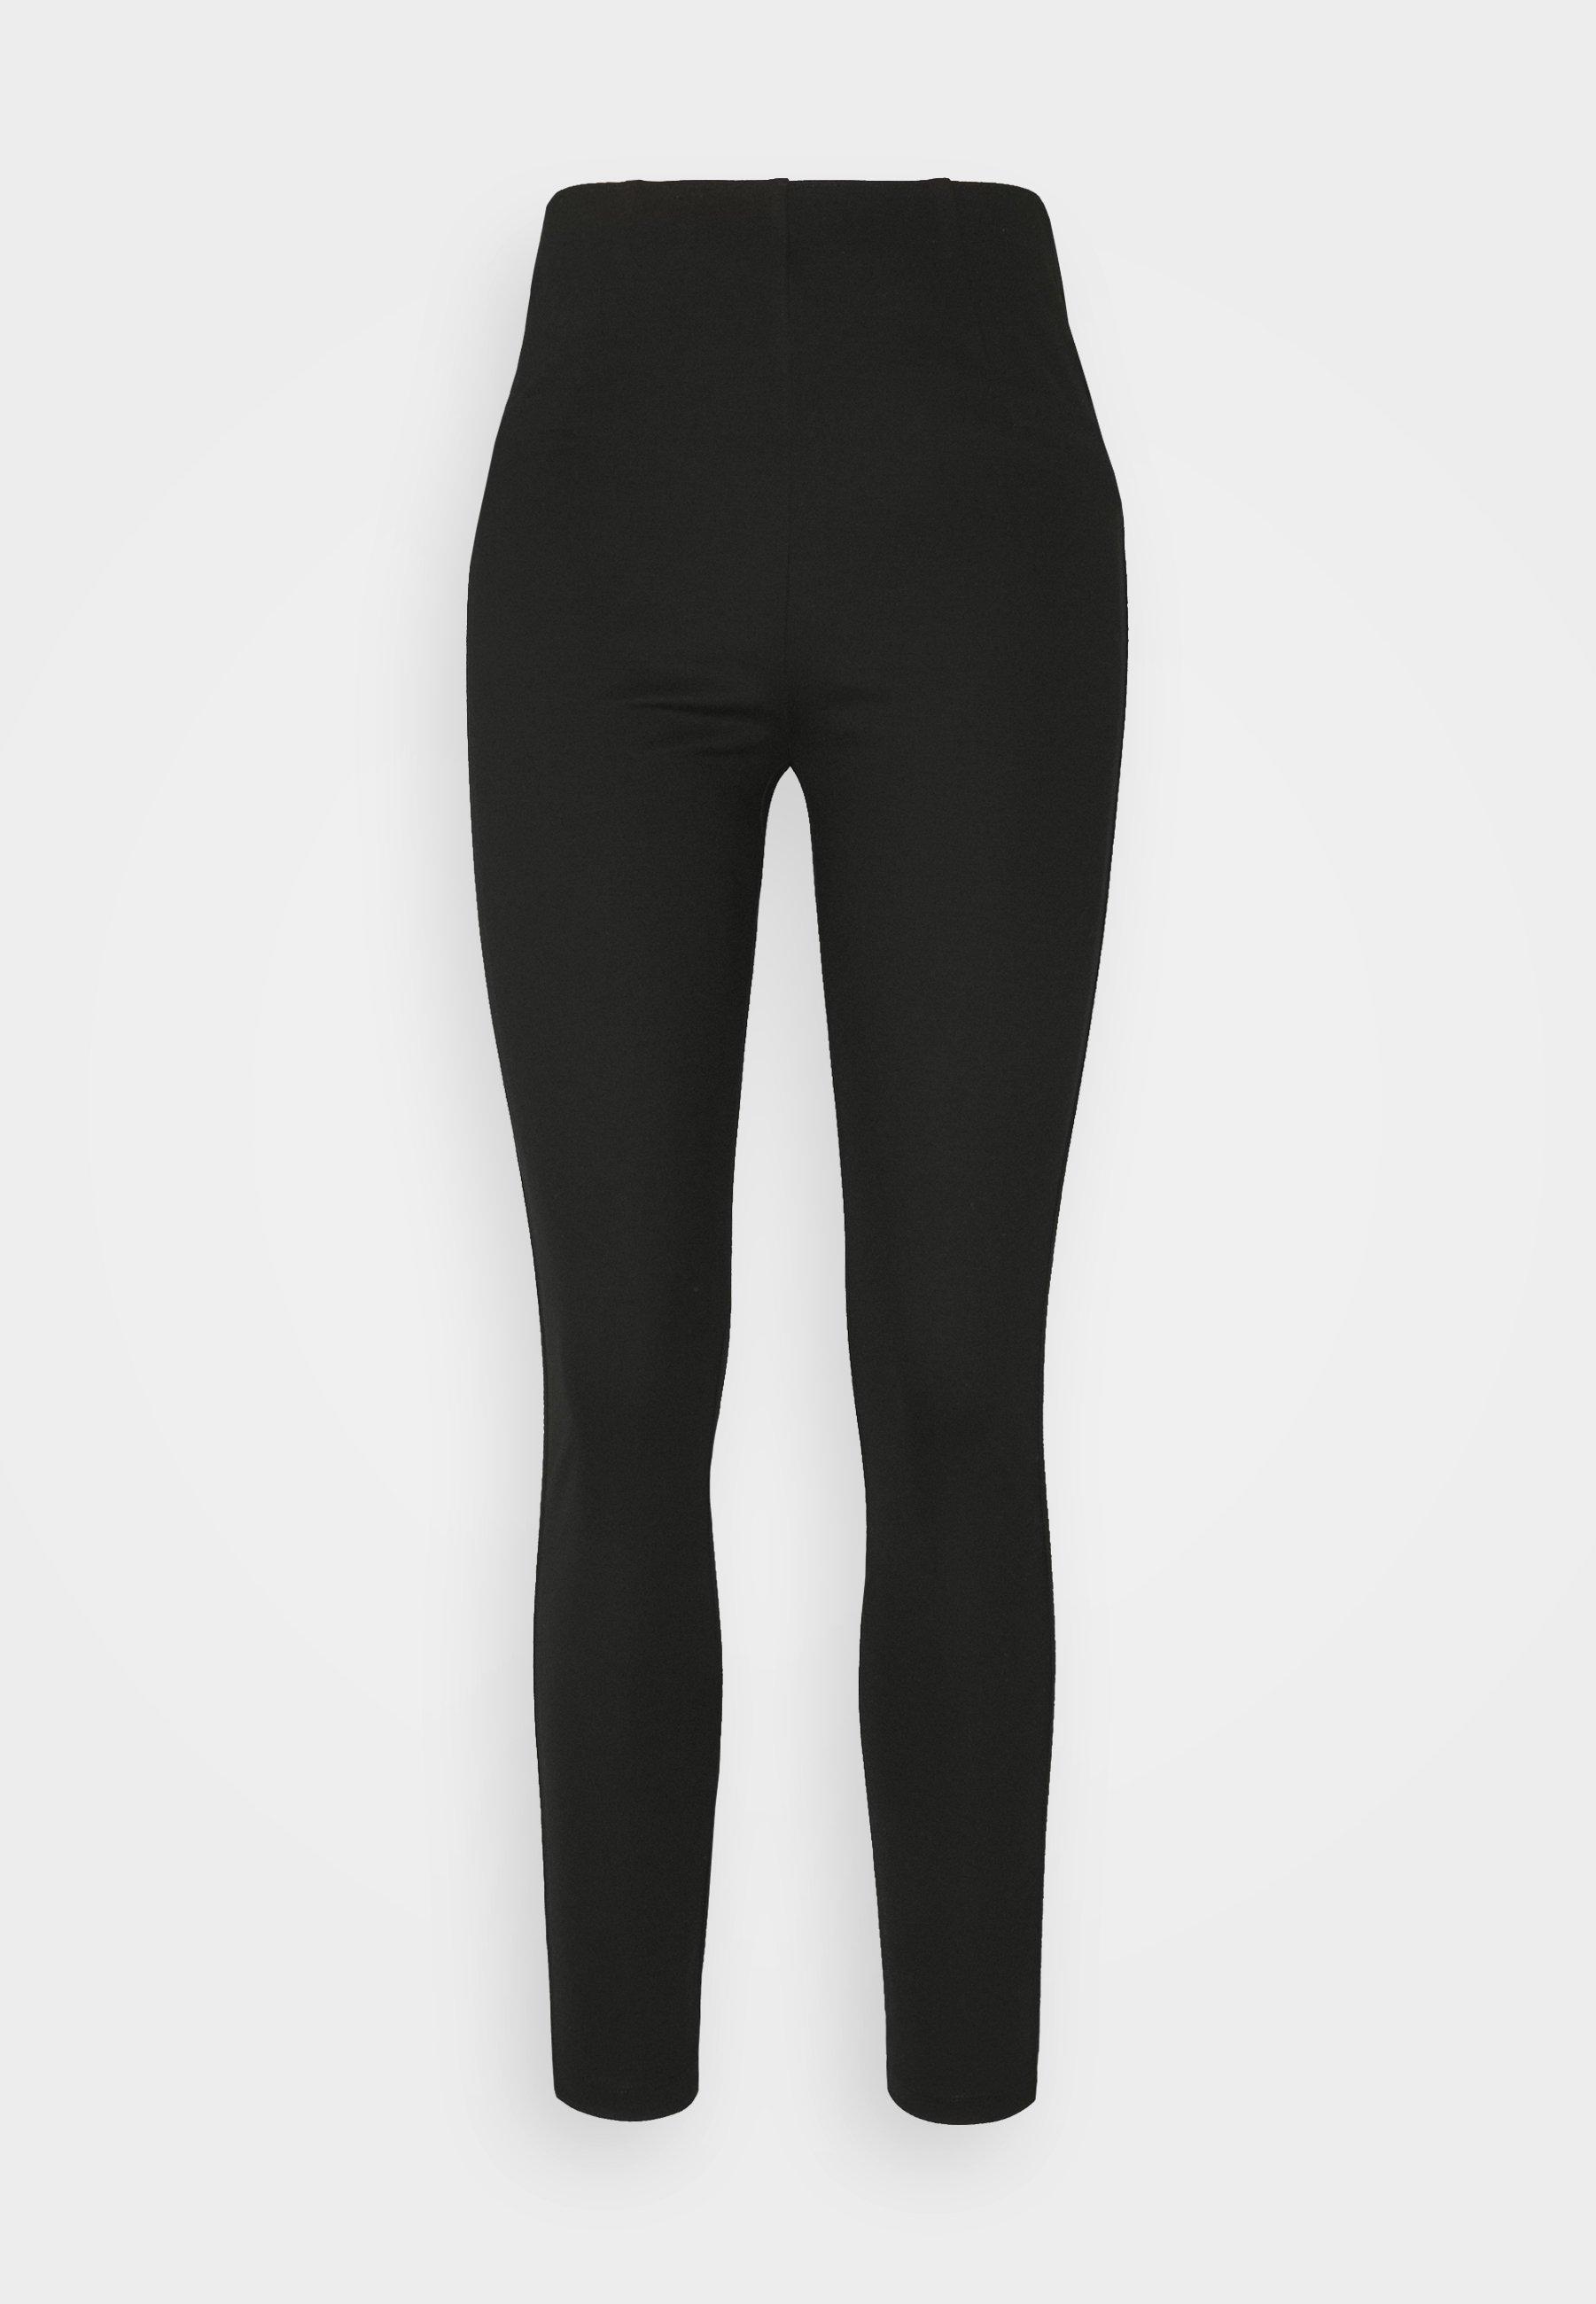 Femme PUNTI - Legging